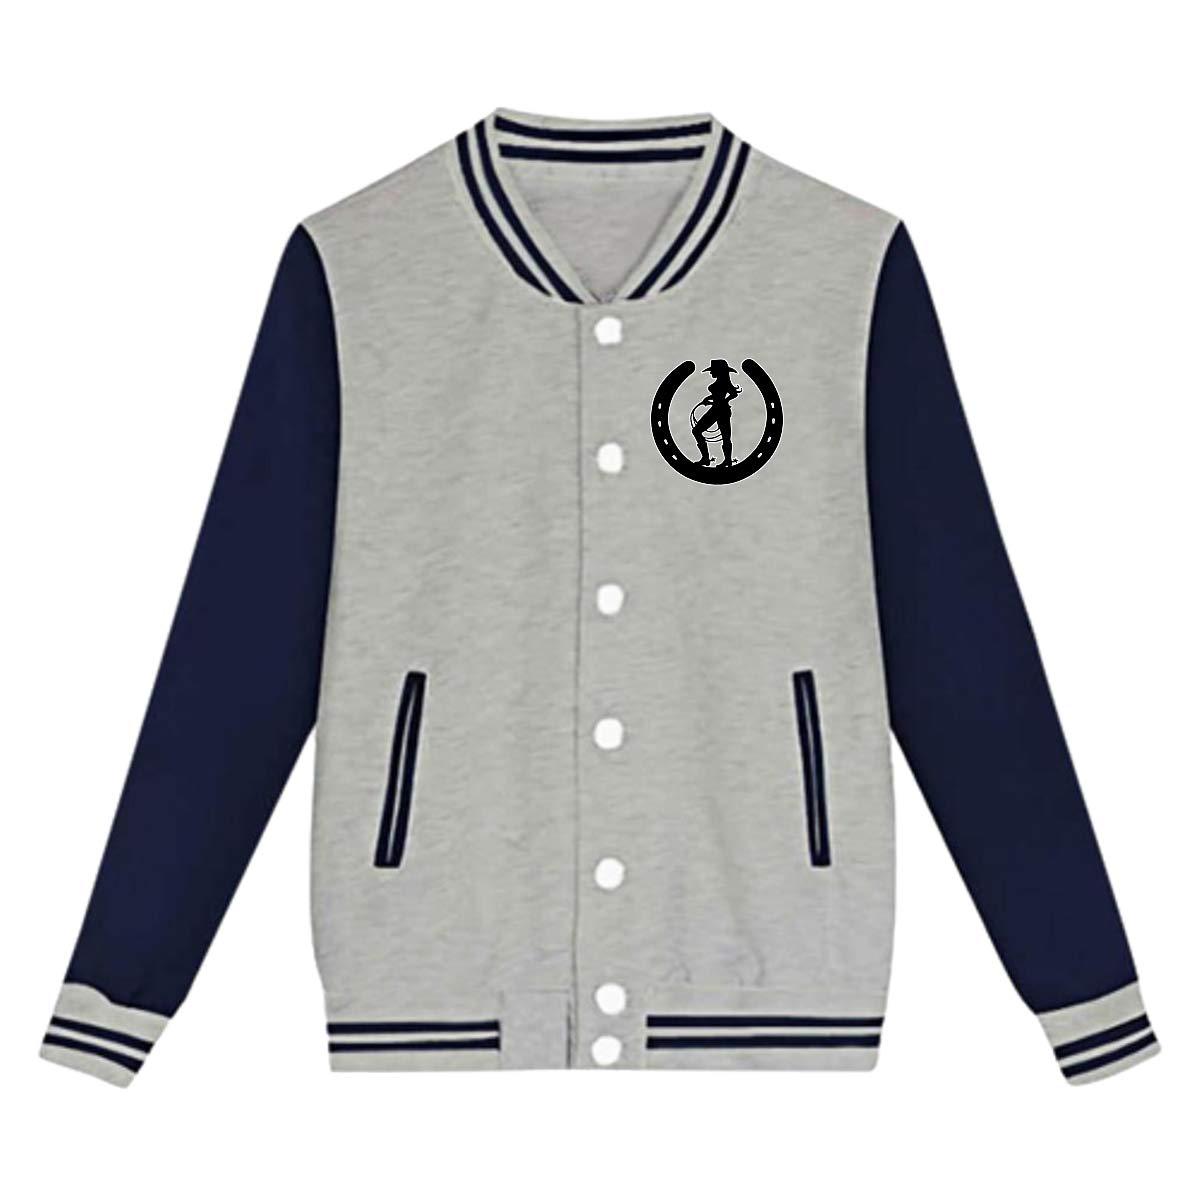 Tina TN Cowgirl Horseshoes Teens Boys Girl Varsity Baseball Jacket Long Sleeve Sport Baseball Uniform Jacket Coat Sweater Black